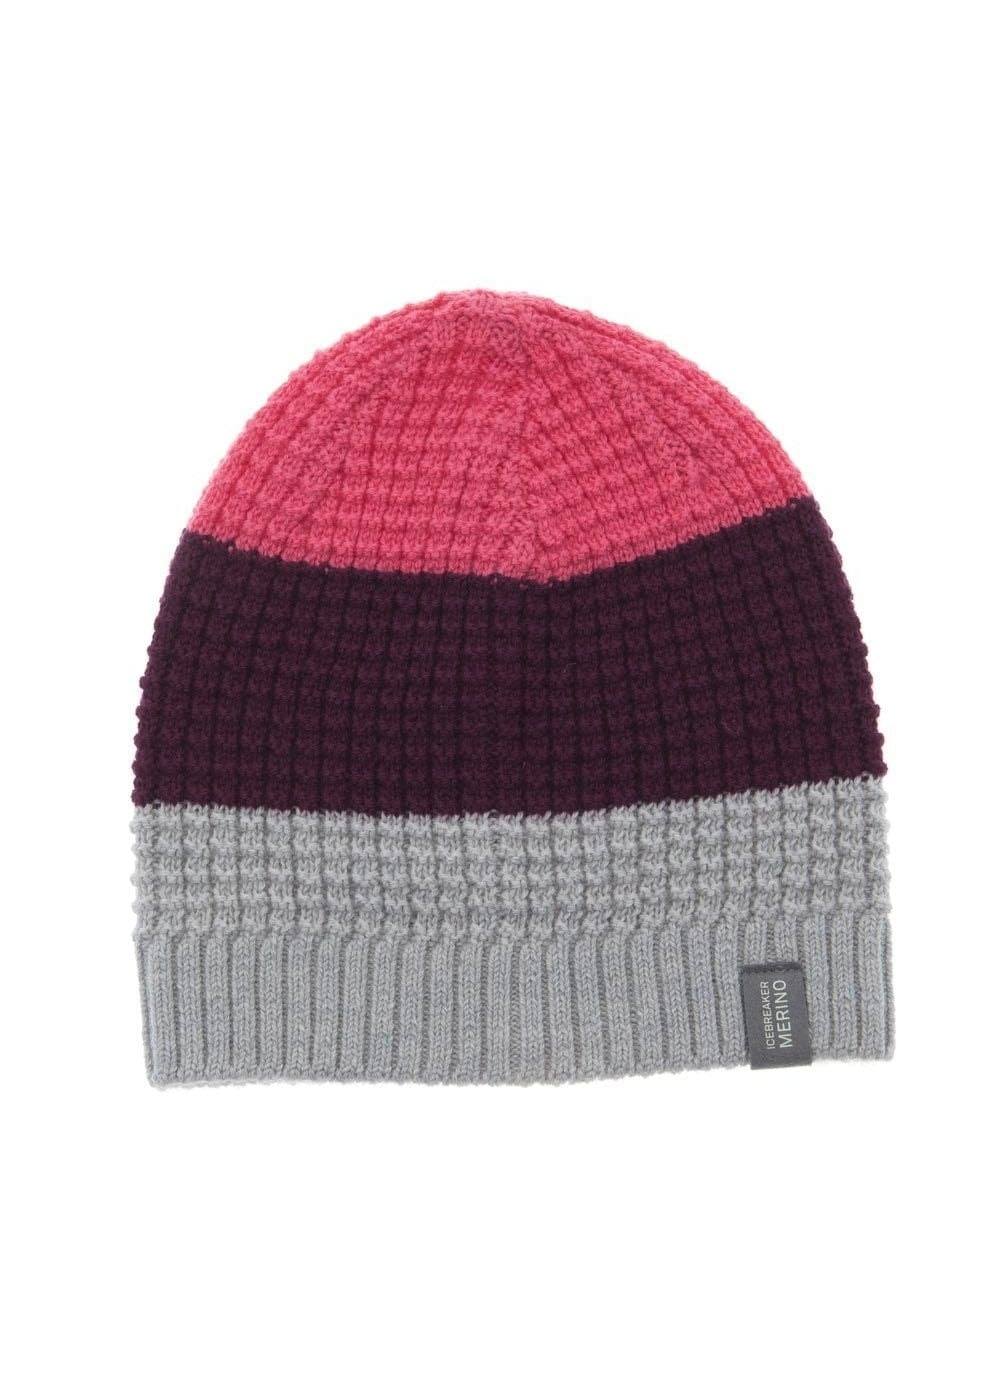 Icebreaker Oasis Beanie Hat- A Hume 6c3031af4dd2